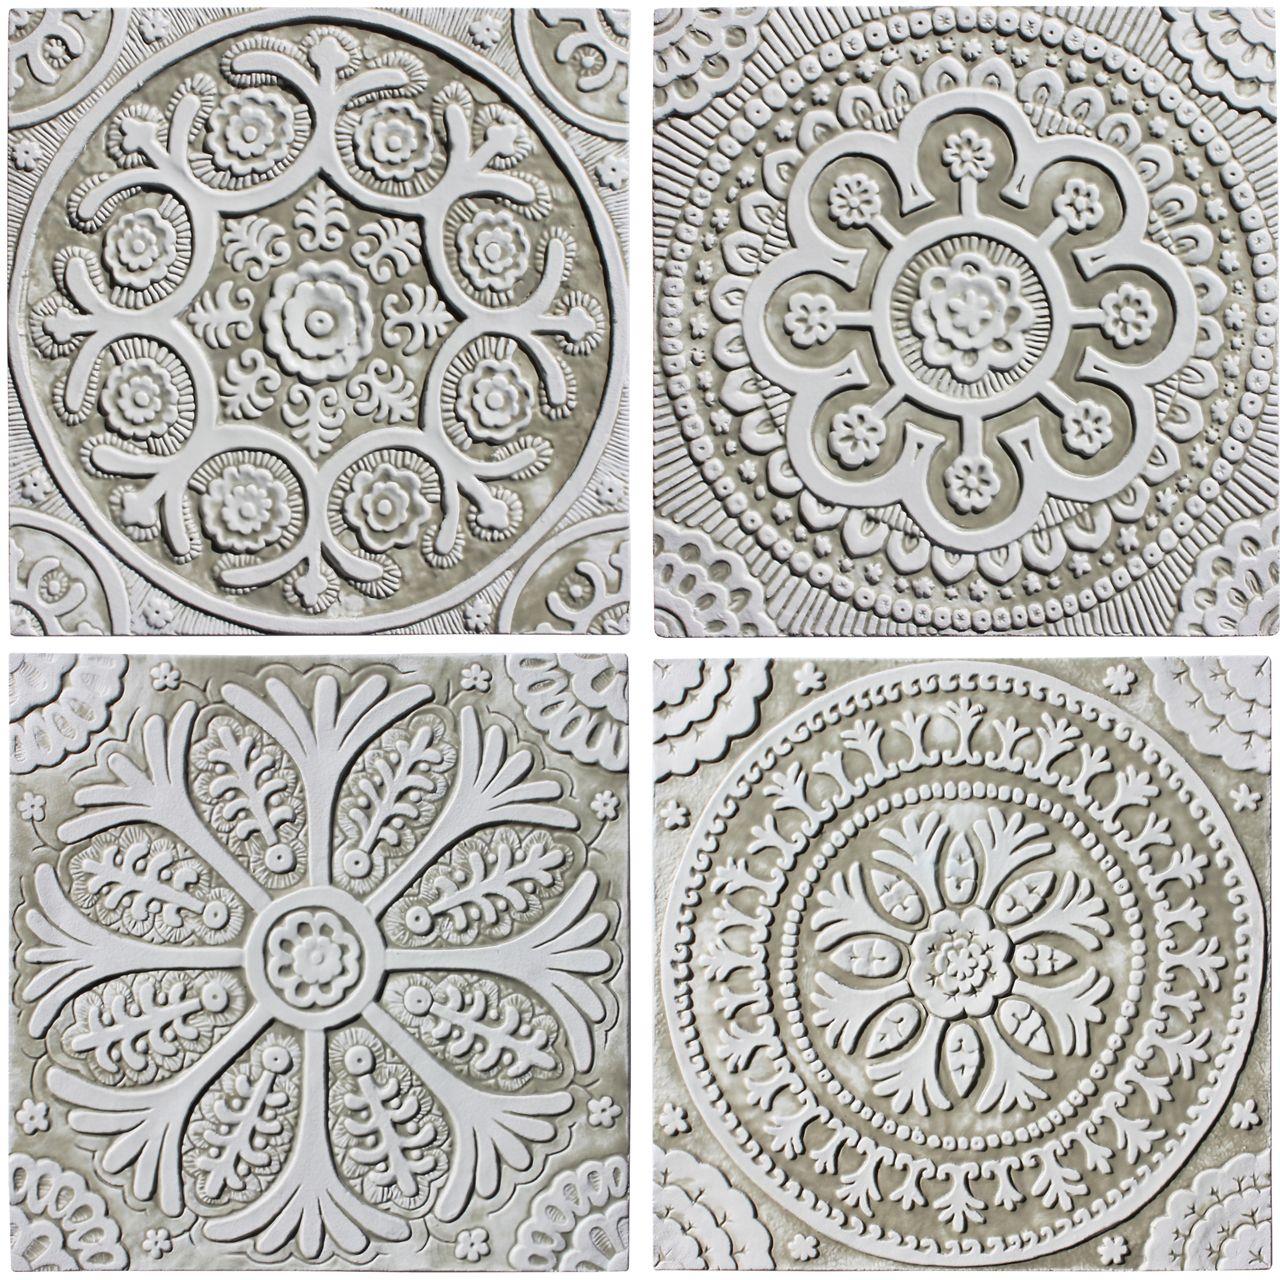 Suzani ceramic wall art 1 white 30cm ceramic wall art walls ceramic wall art suzani designs white collection hand made tiles architectural ceramics doublecrazyfo Choice Image